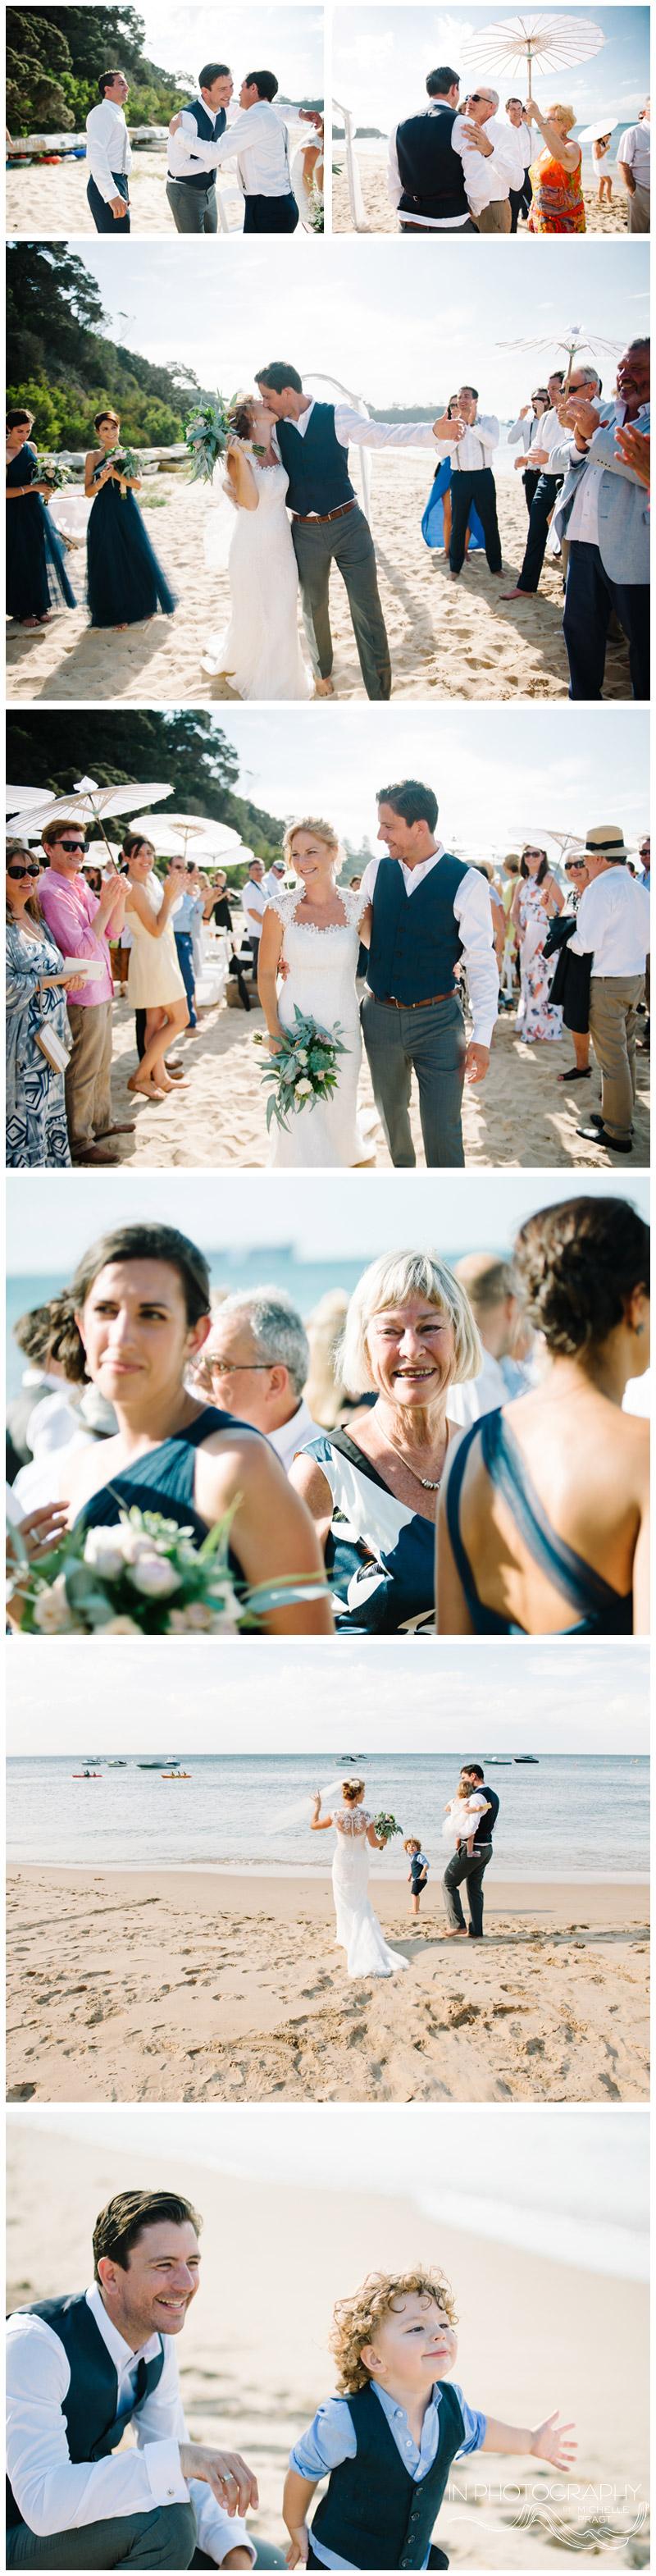 Happy bride and groom after Portsea wedding ceremony